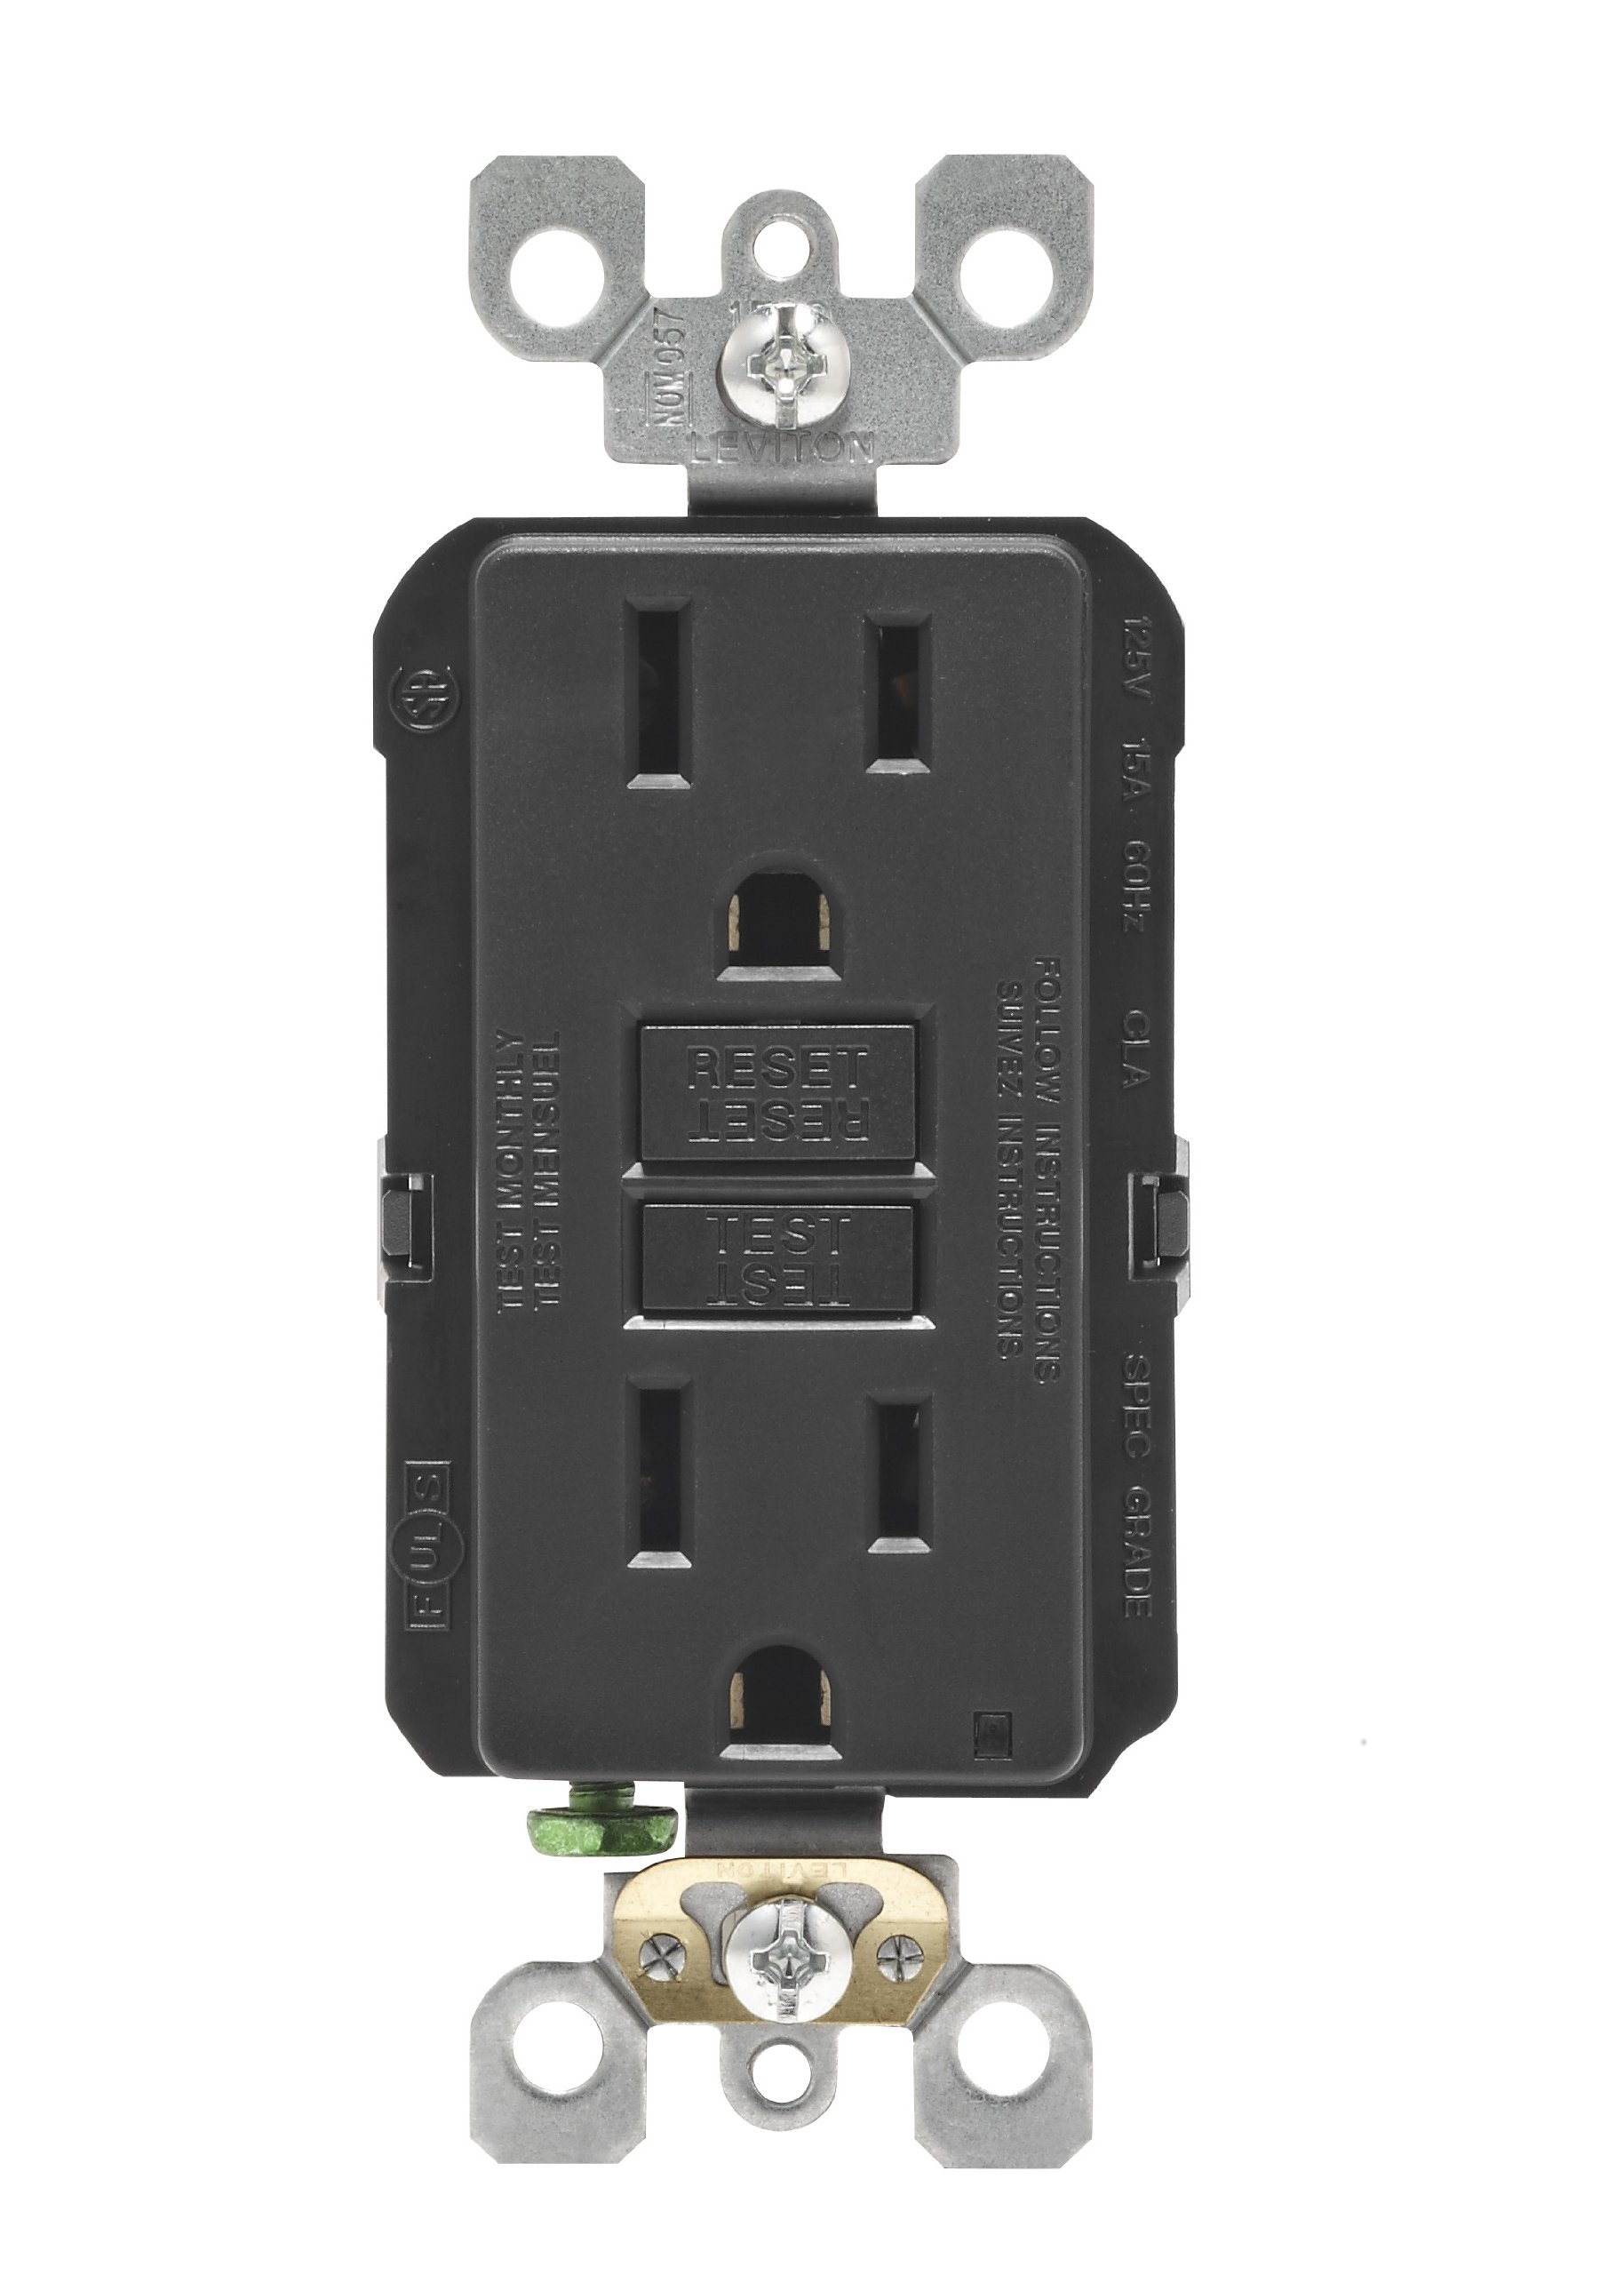 Leviton N7599-E 15-Amp 125-Volt SmartLock Pro Slim GFCI Receptacle, Black